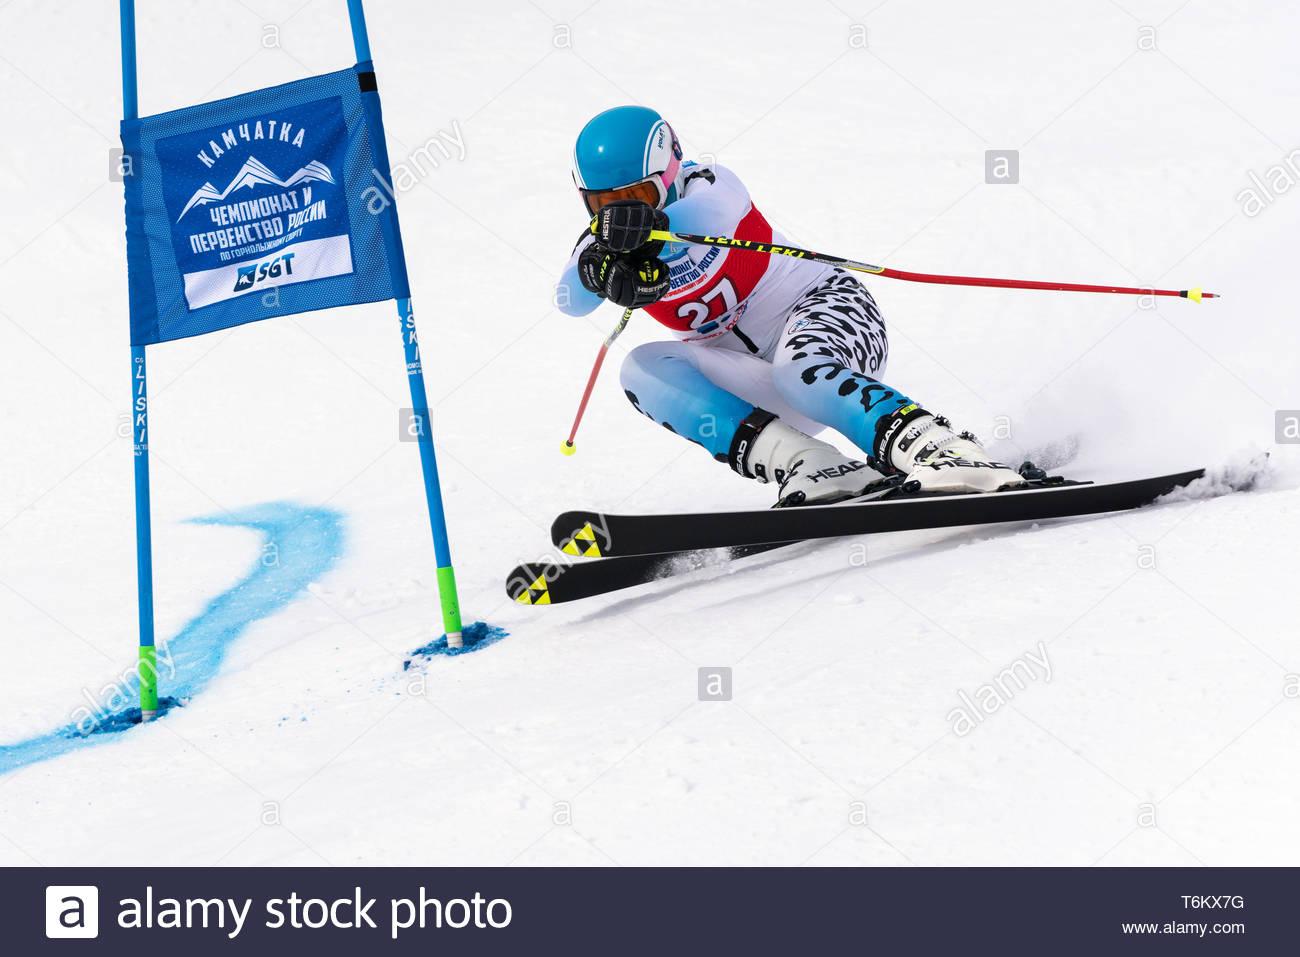 KAMCHATKA PENINSULA, RUSSIA - APR 2, 2019: Russian Women's Alpine Skiing Cup, International Ski Federation Championship giant slalom. Mountain skier G - Stock Image